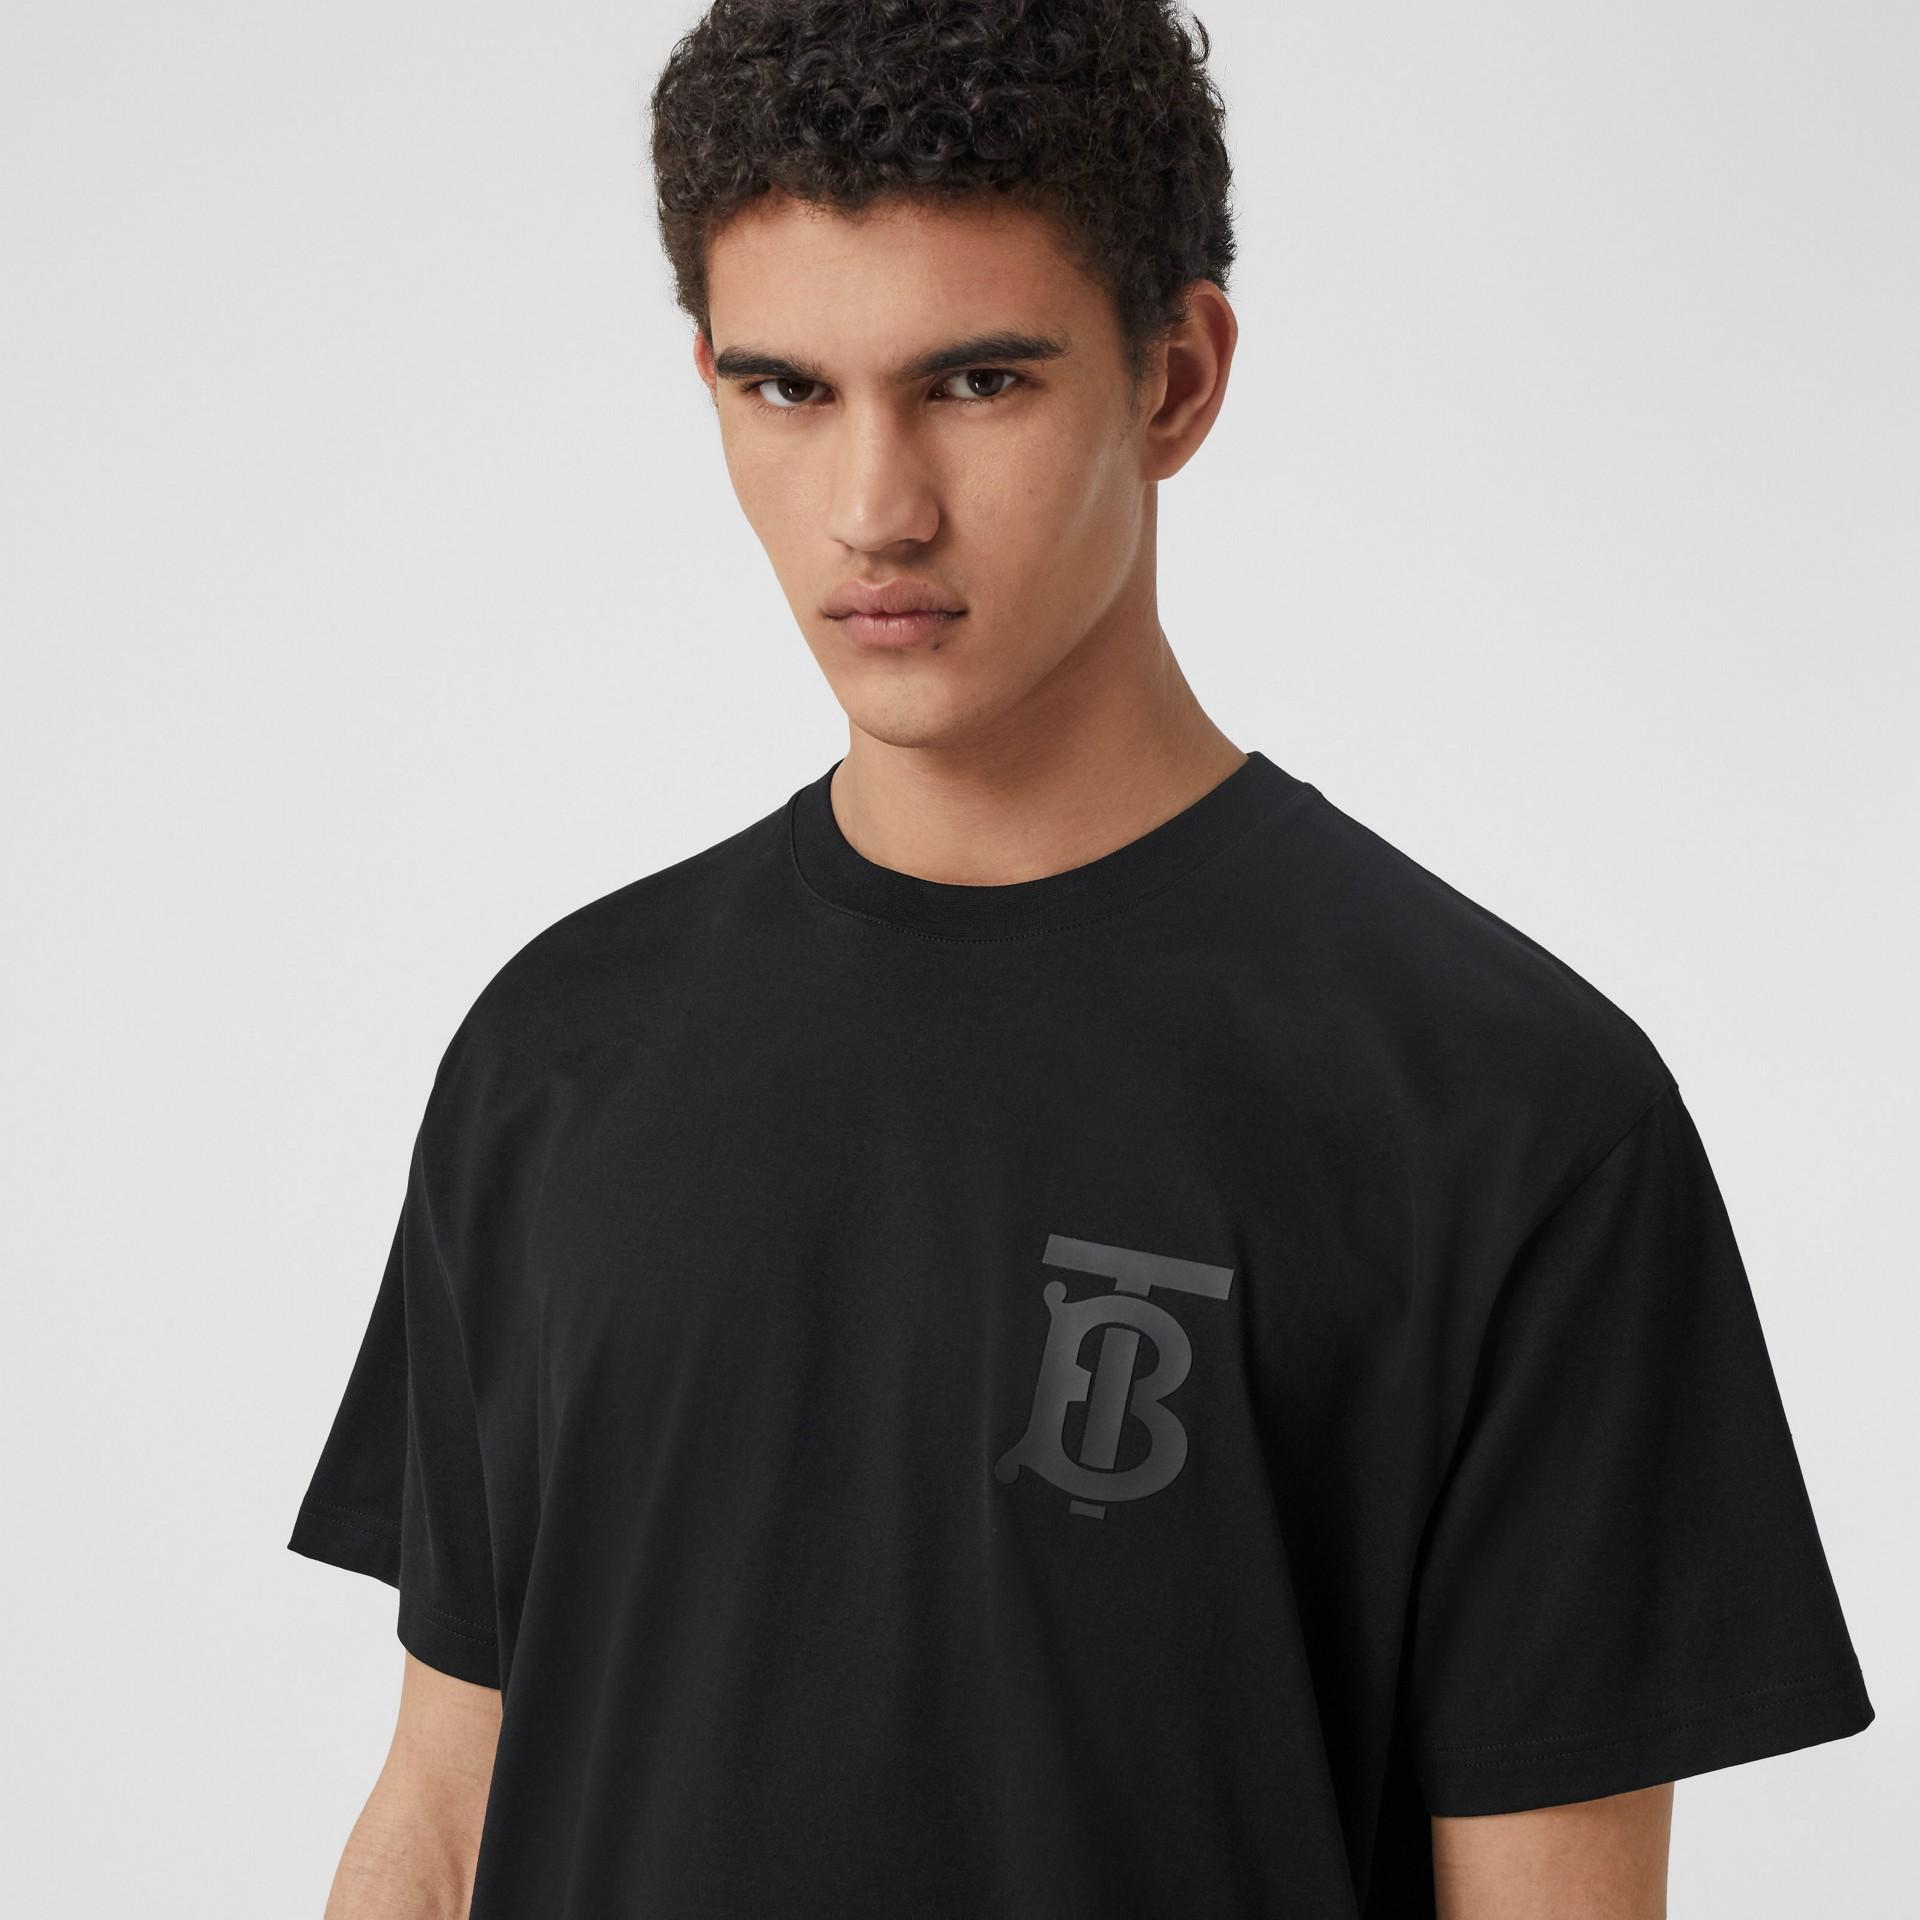 Monogram Motif Cotton Oversized T-shirt in Black - Men | Burberry United Kingdom - gallery image 1